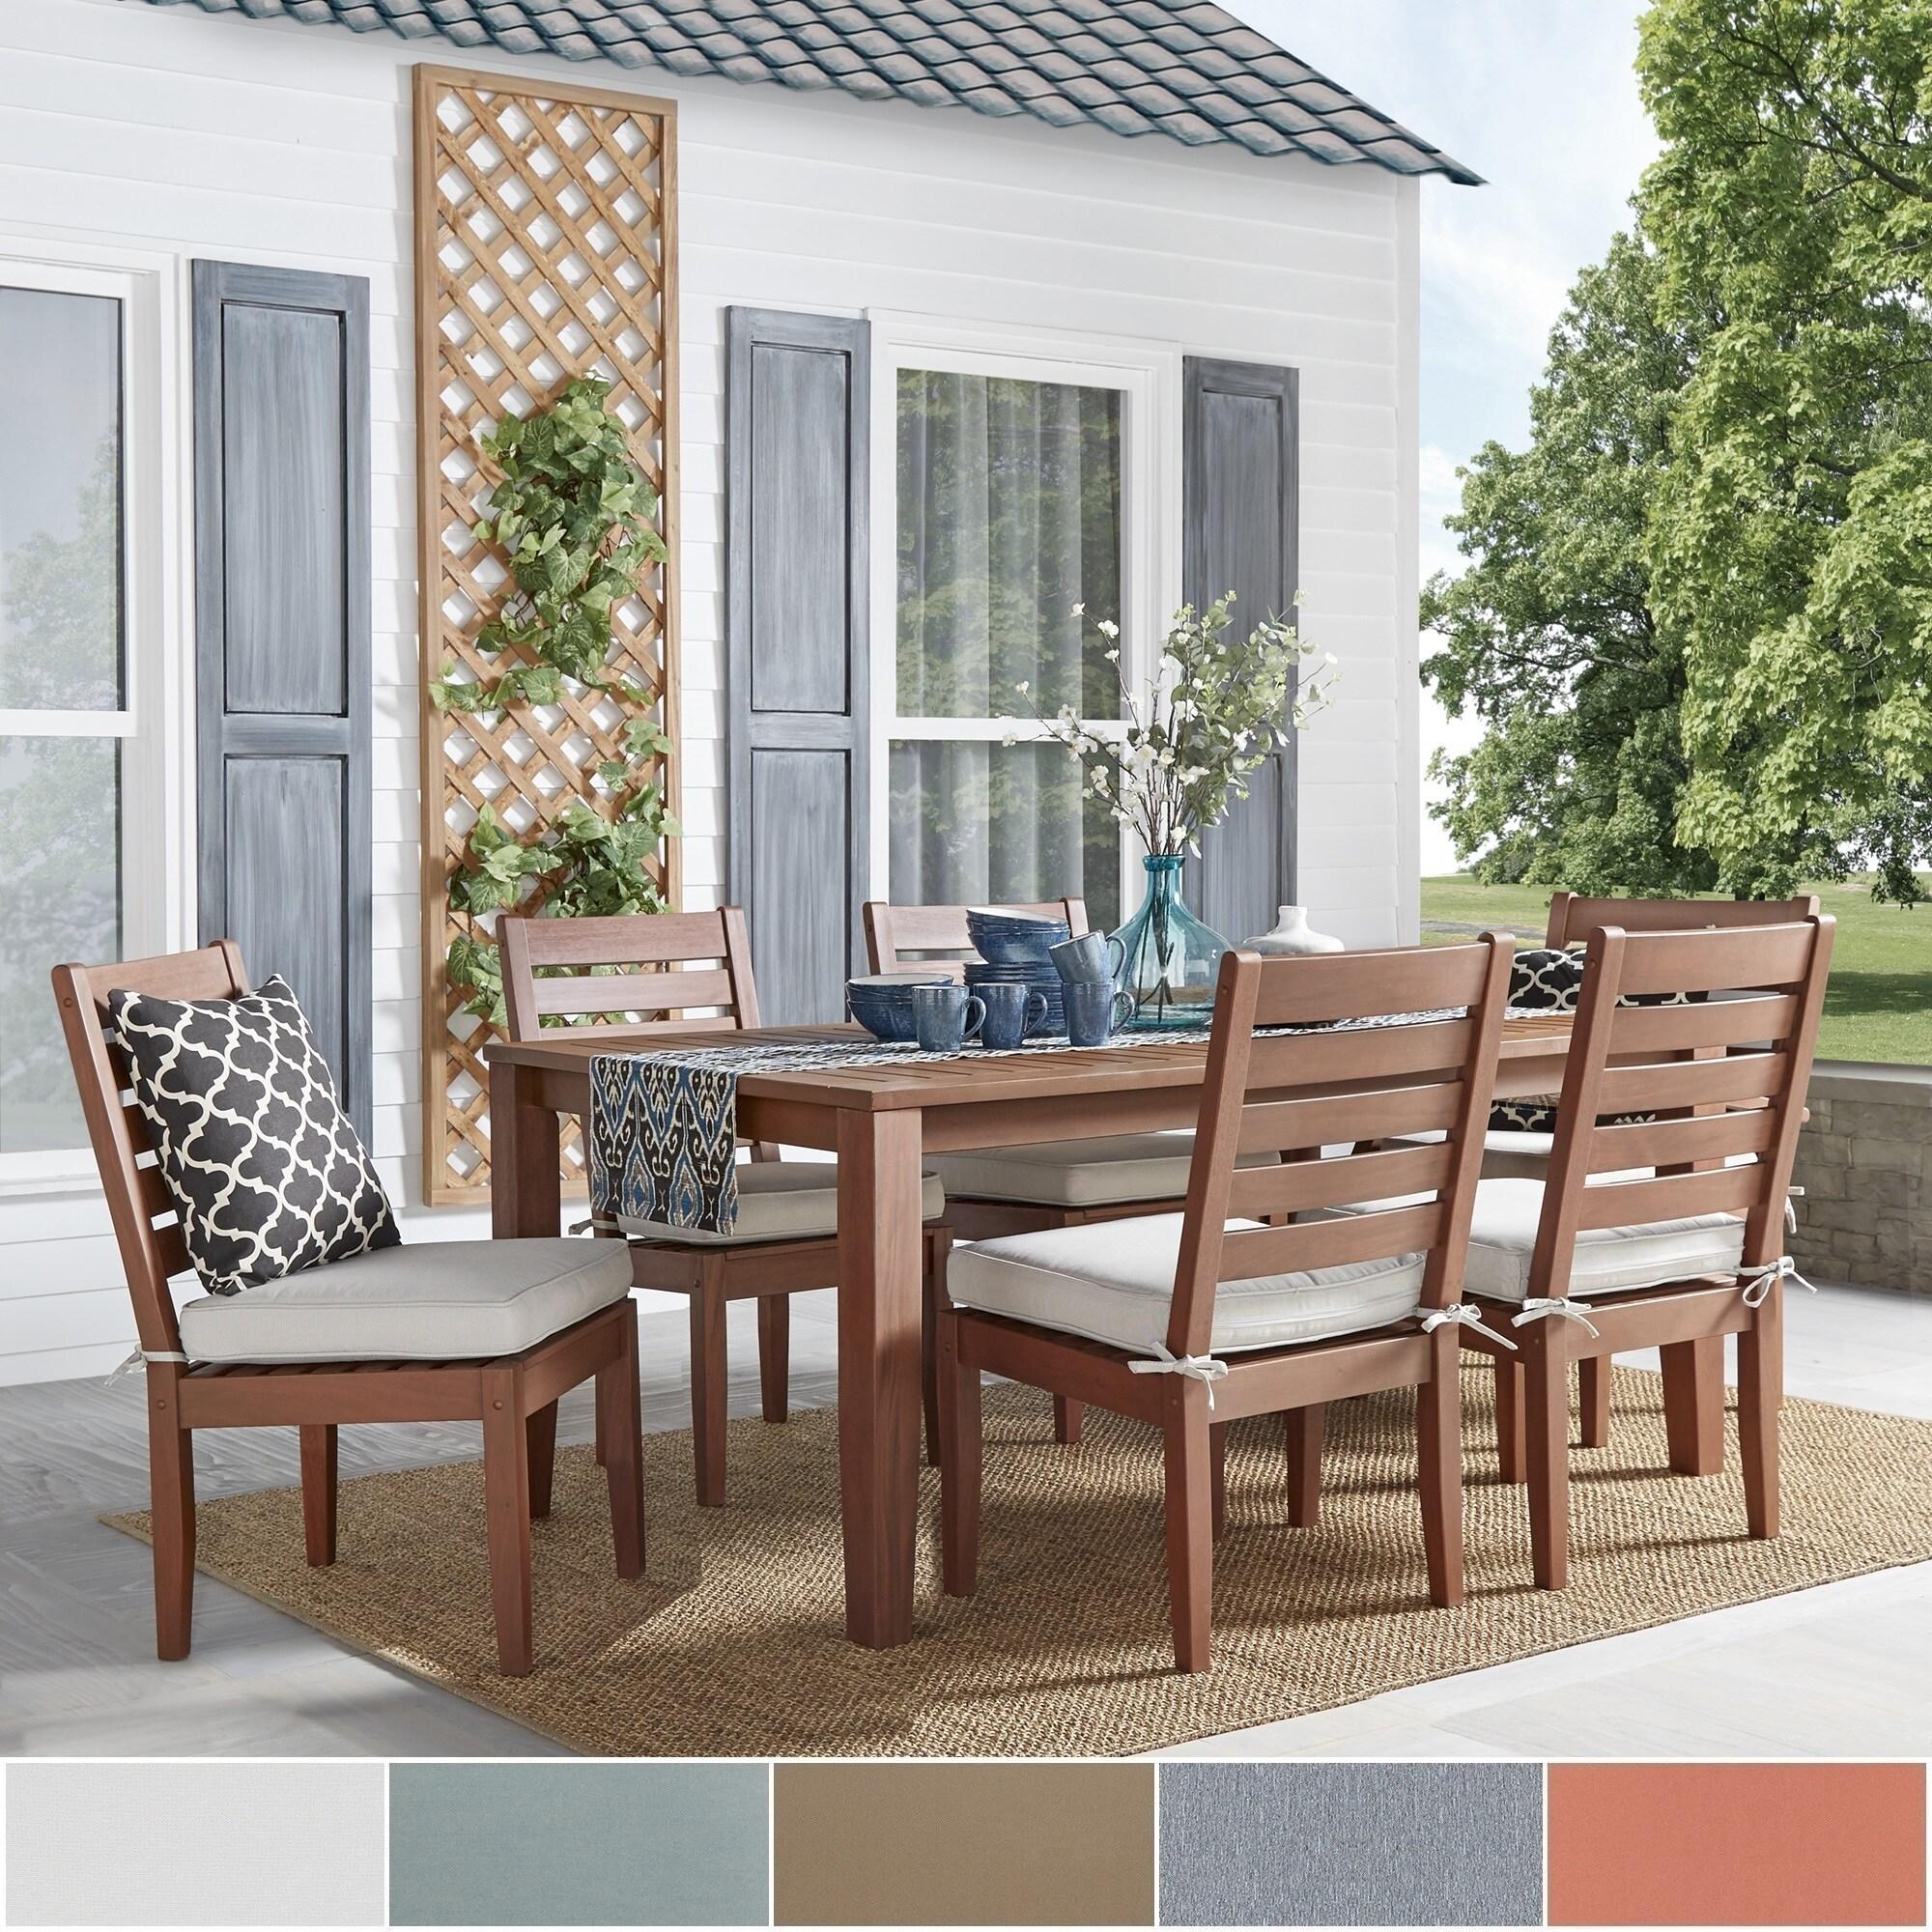 Yasawa Modern Wood Outdoor Rectangle 7 Piece Dining Set   Brown INSPIRE Q  Oasis